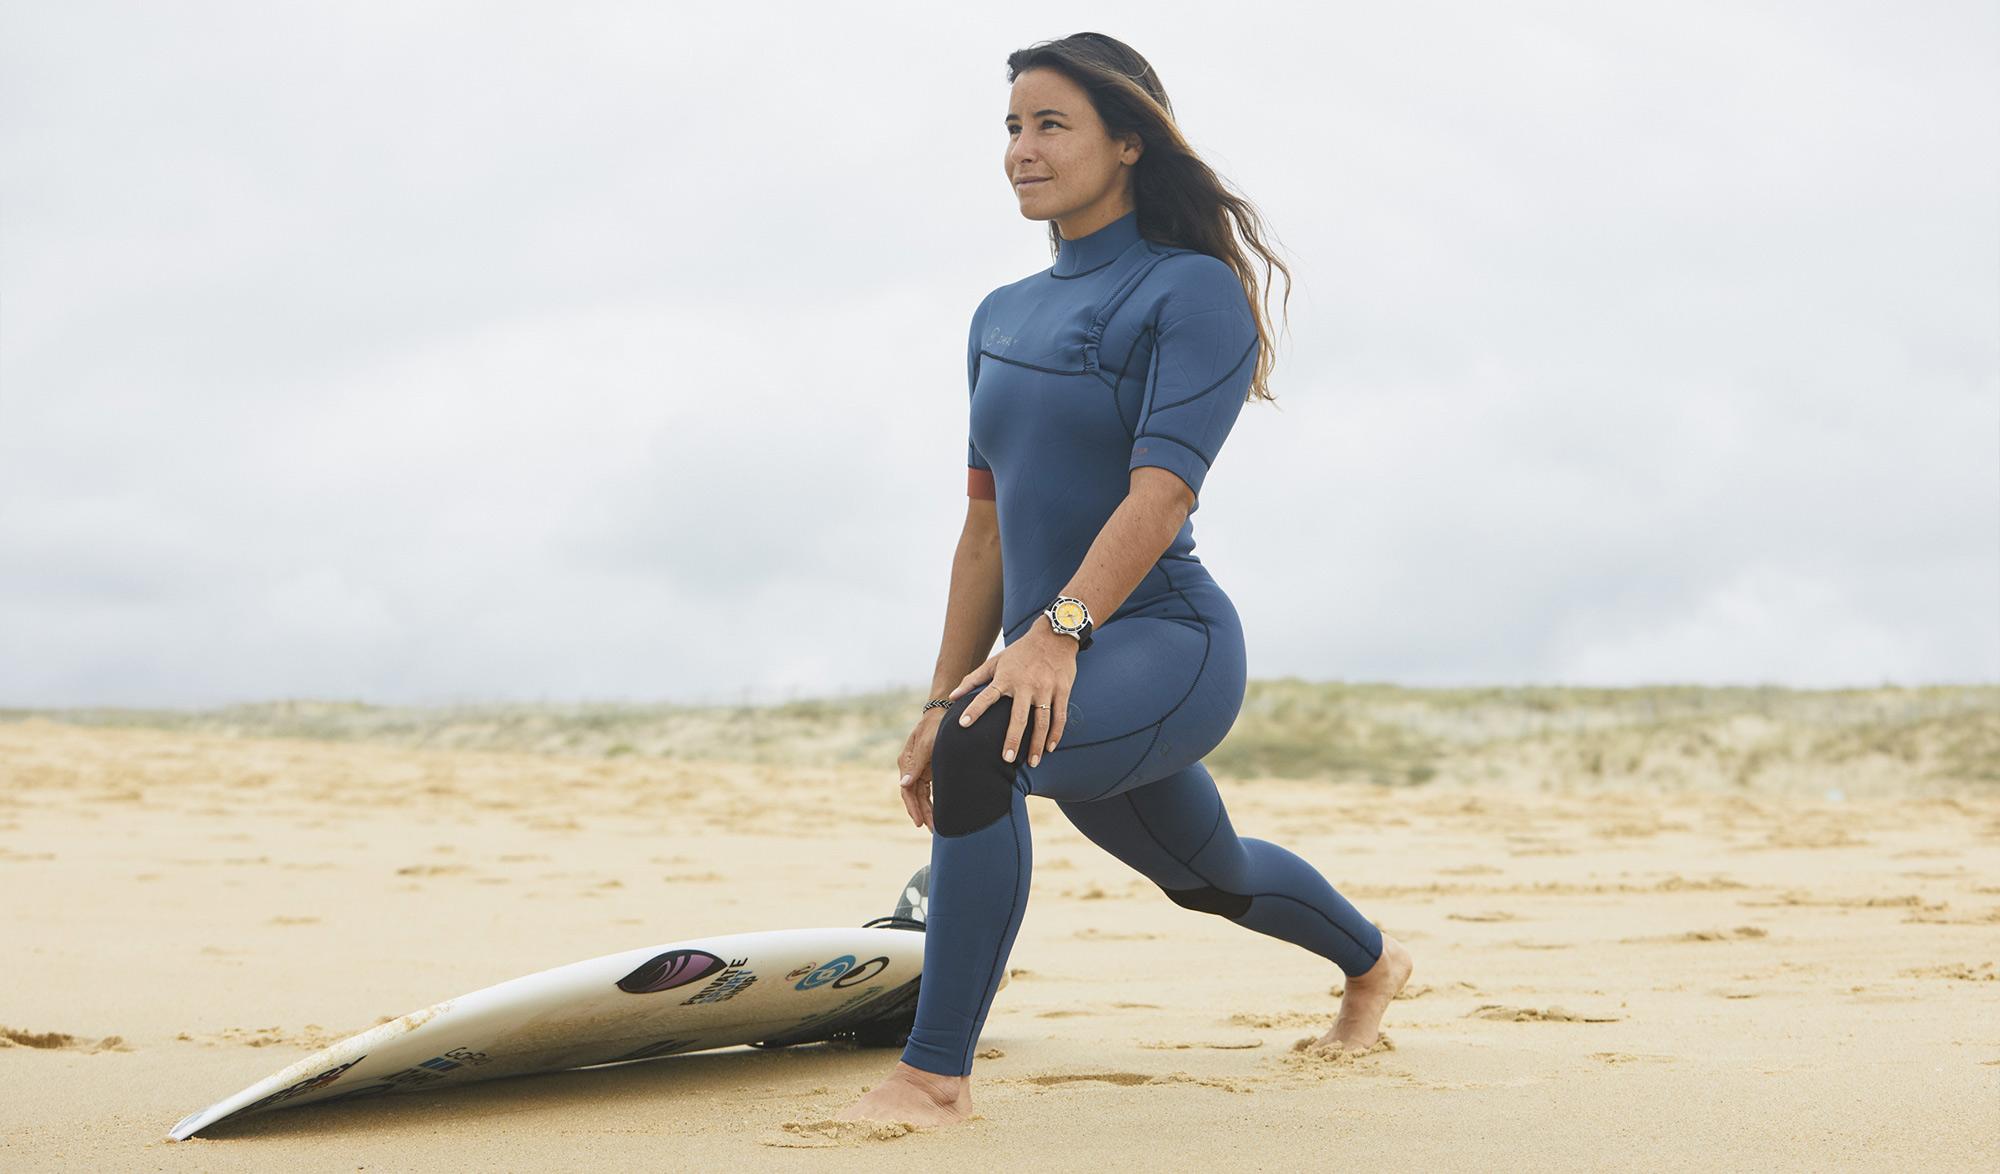 Johanne Defay surf